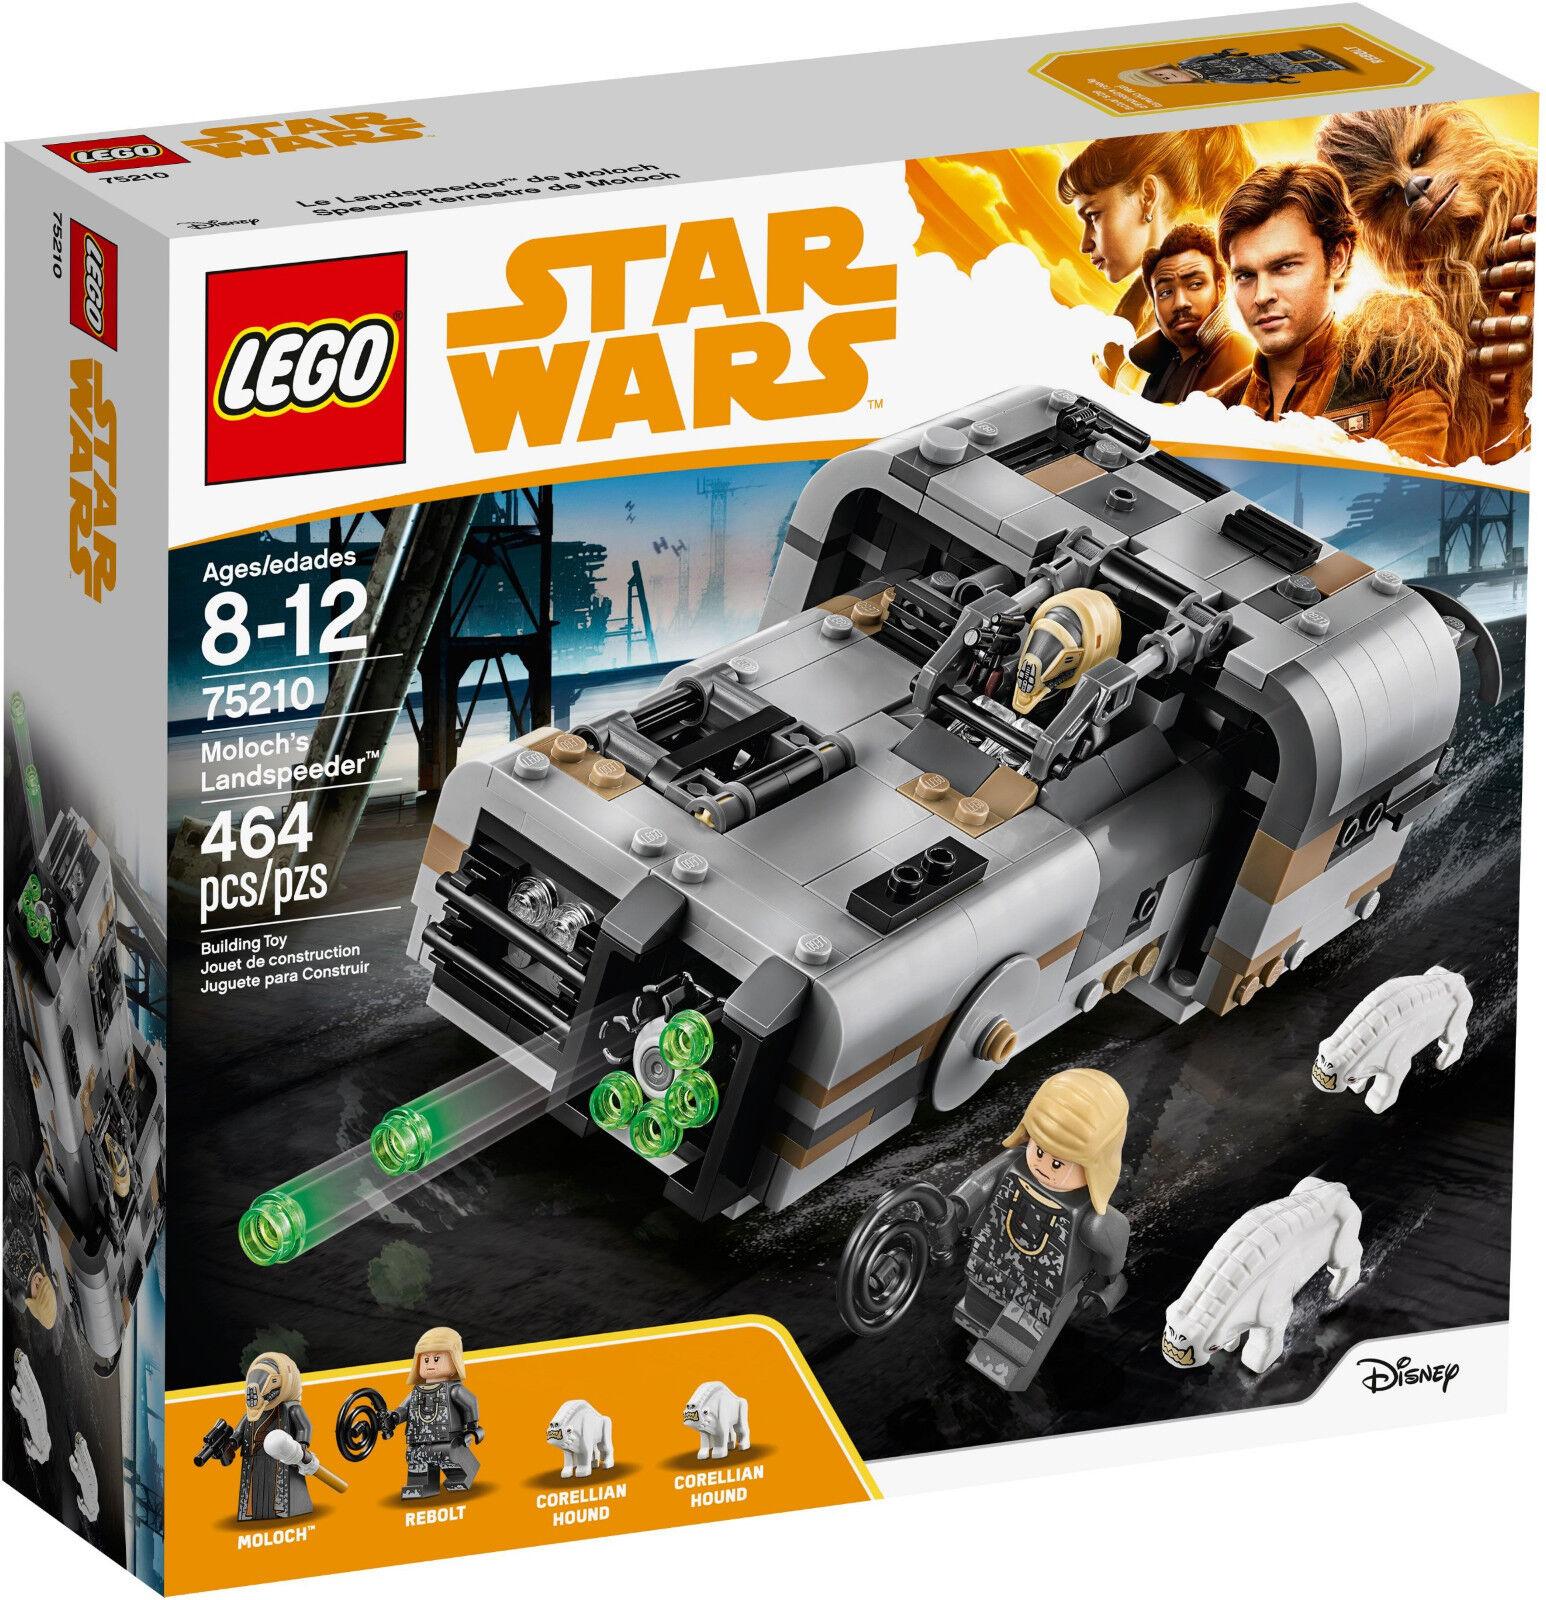 LEGO Star Wars - 75210 Moloch's Landspeeder mit Rebolt - Neu & OVP